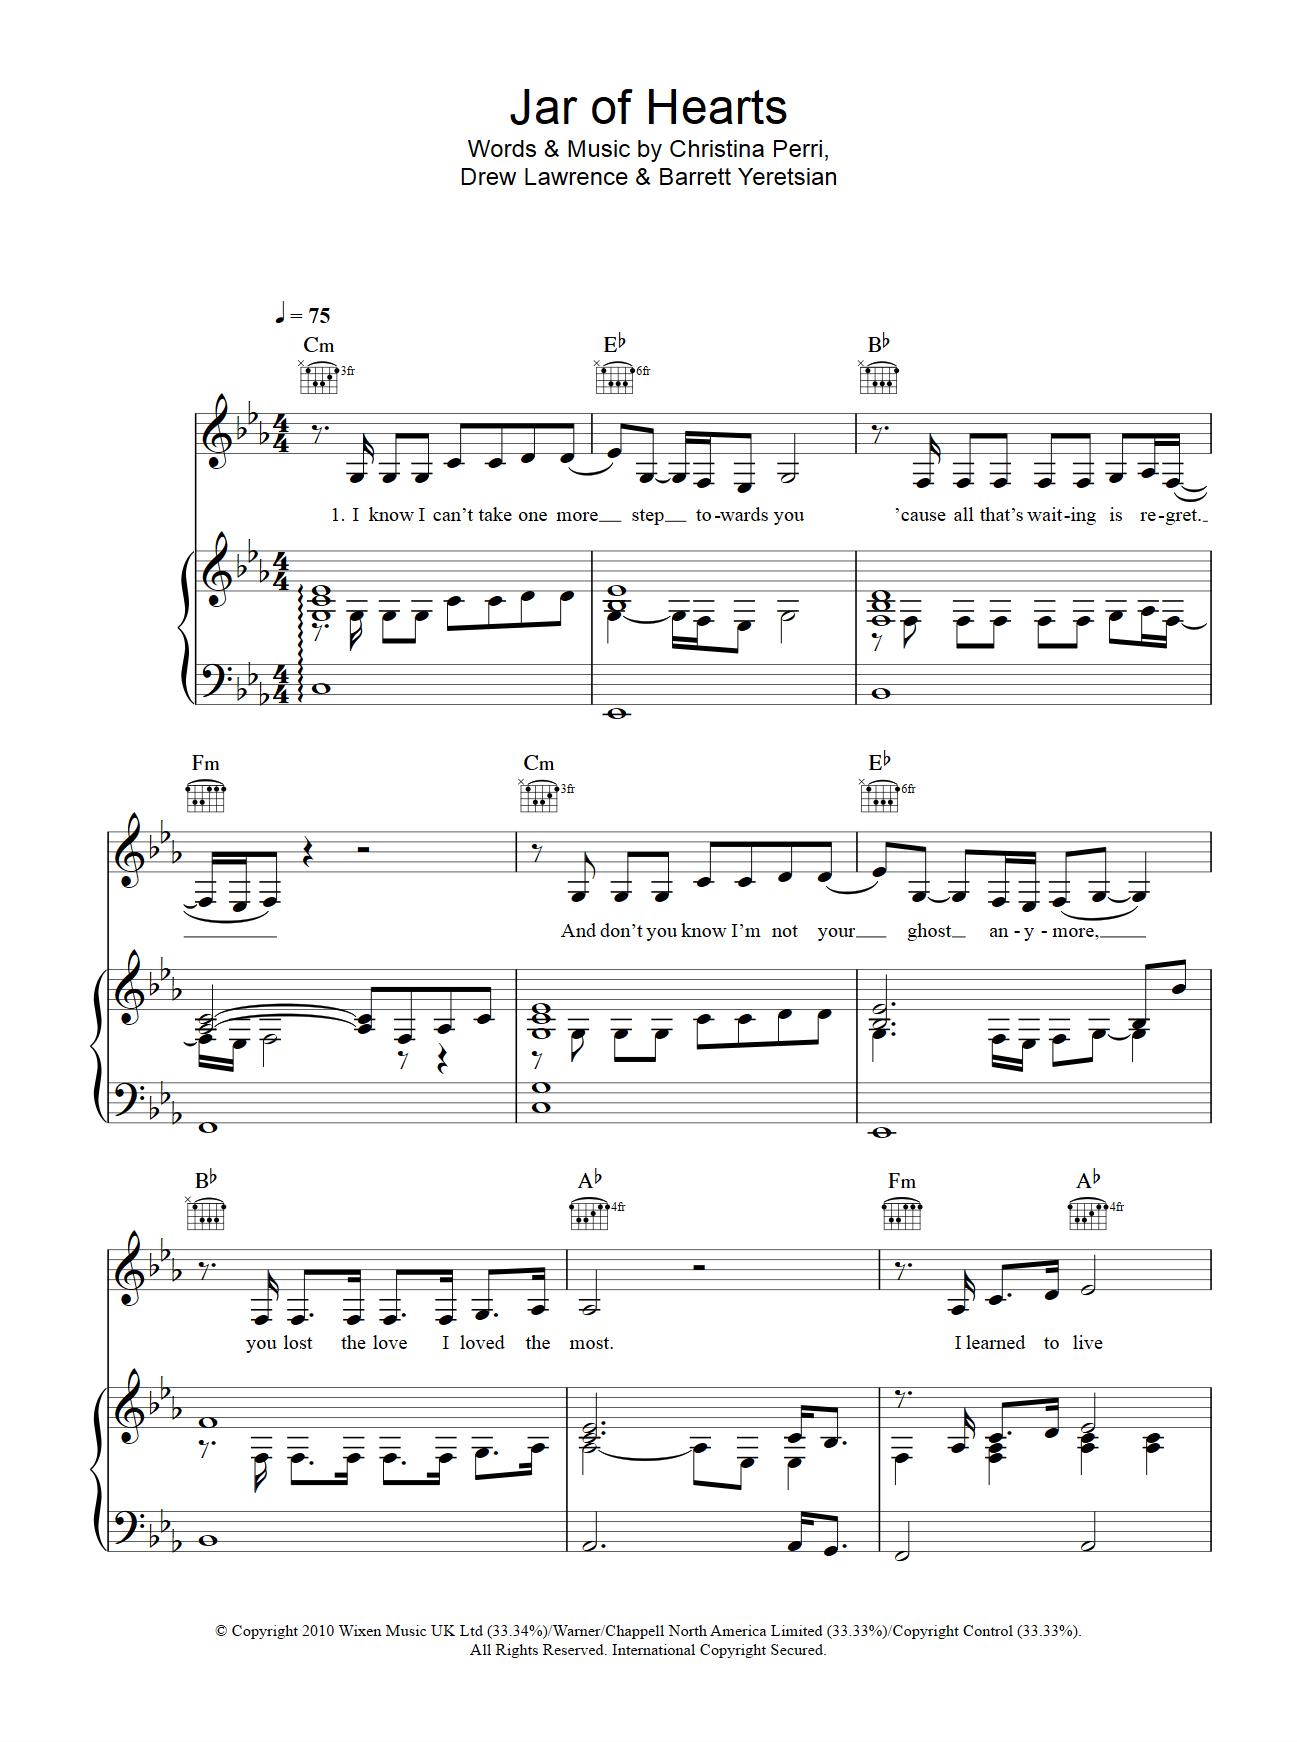 jar of heart钢琴谱,最好是伴奏谱子,不是也可以